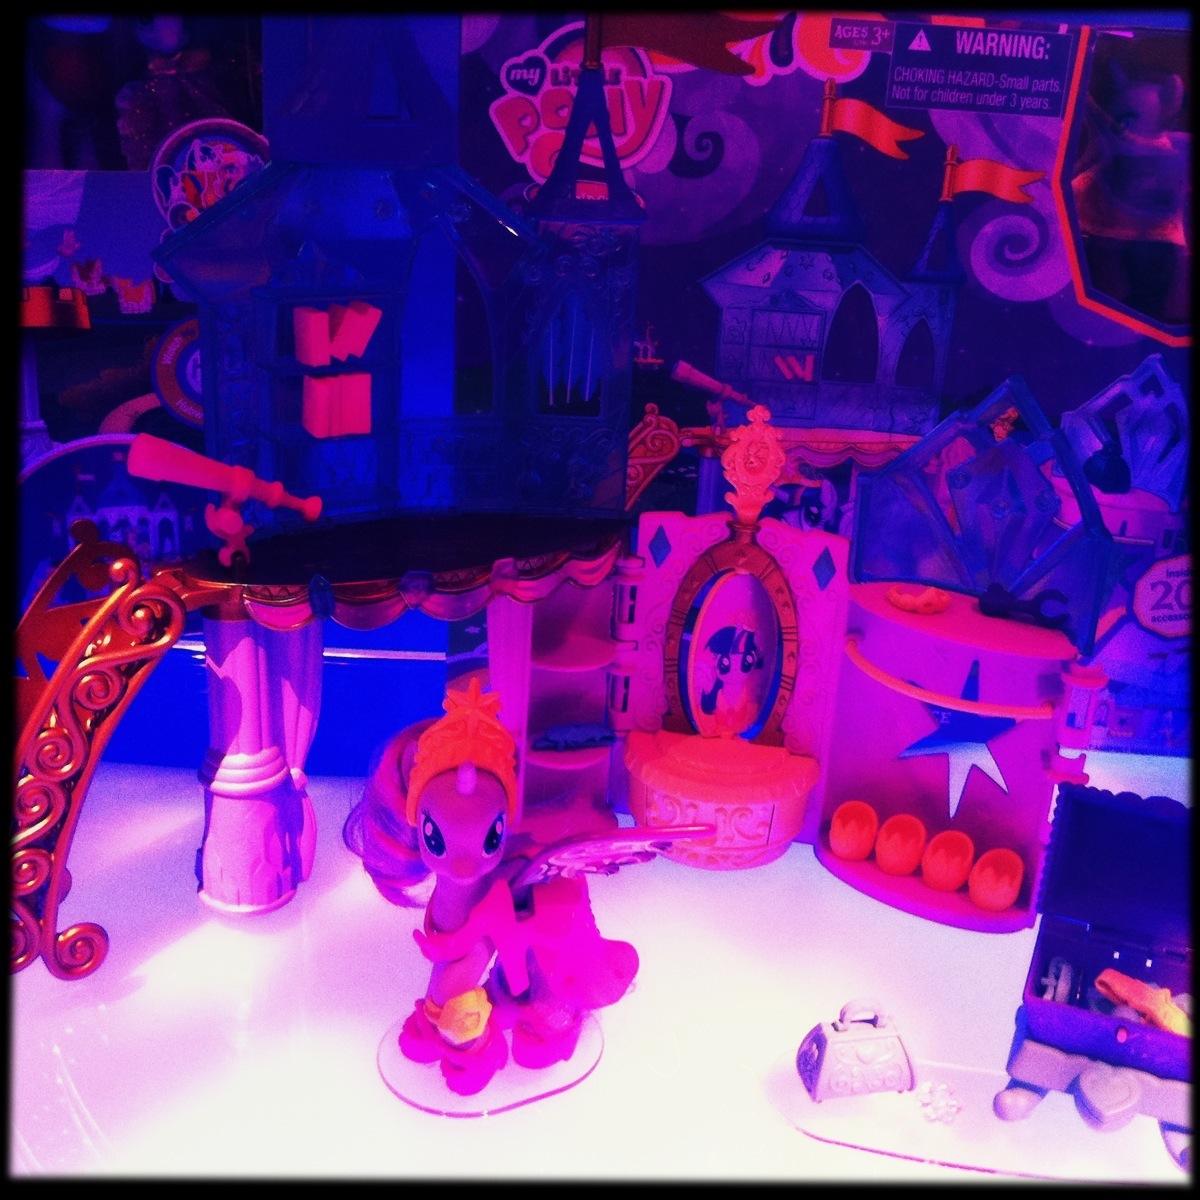 201-toyfair-hasbro5.JPG